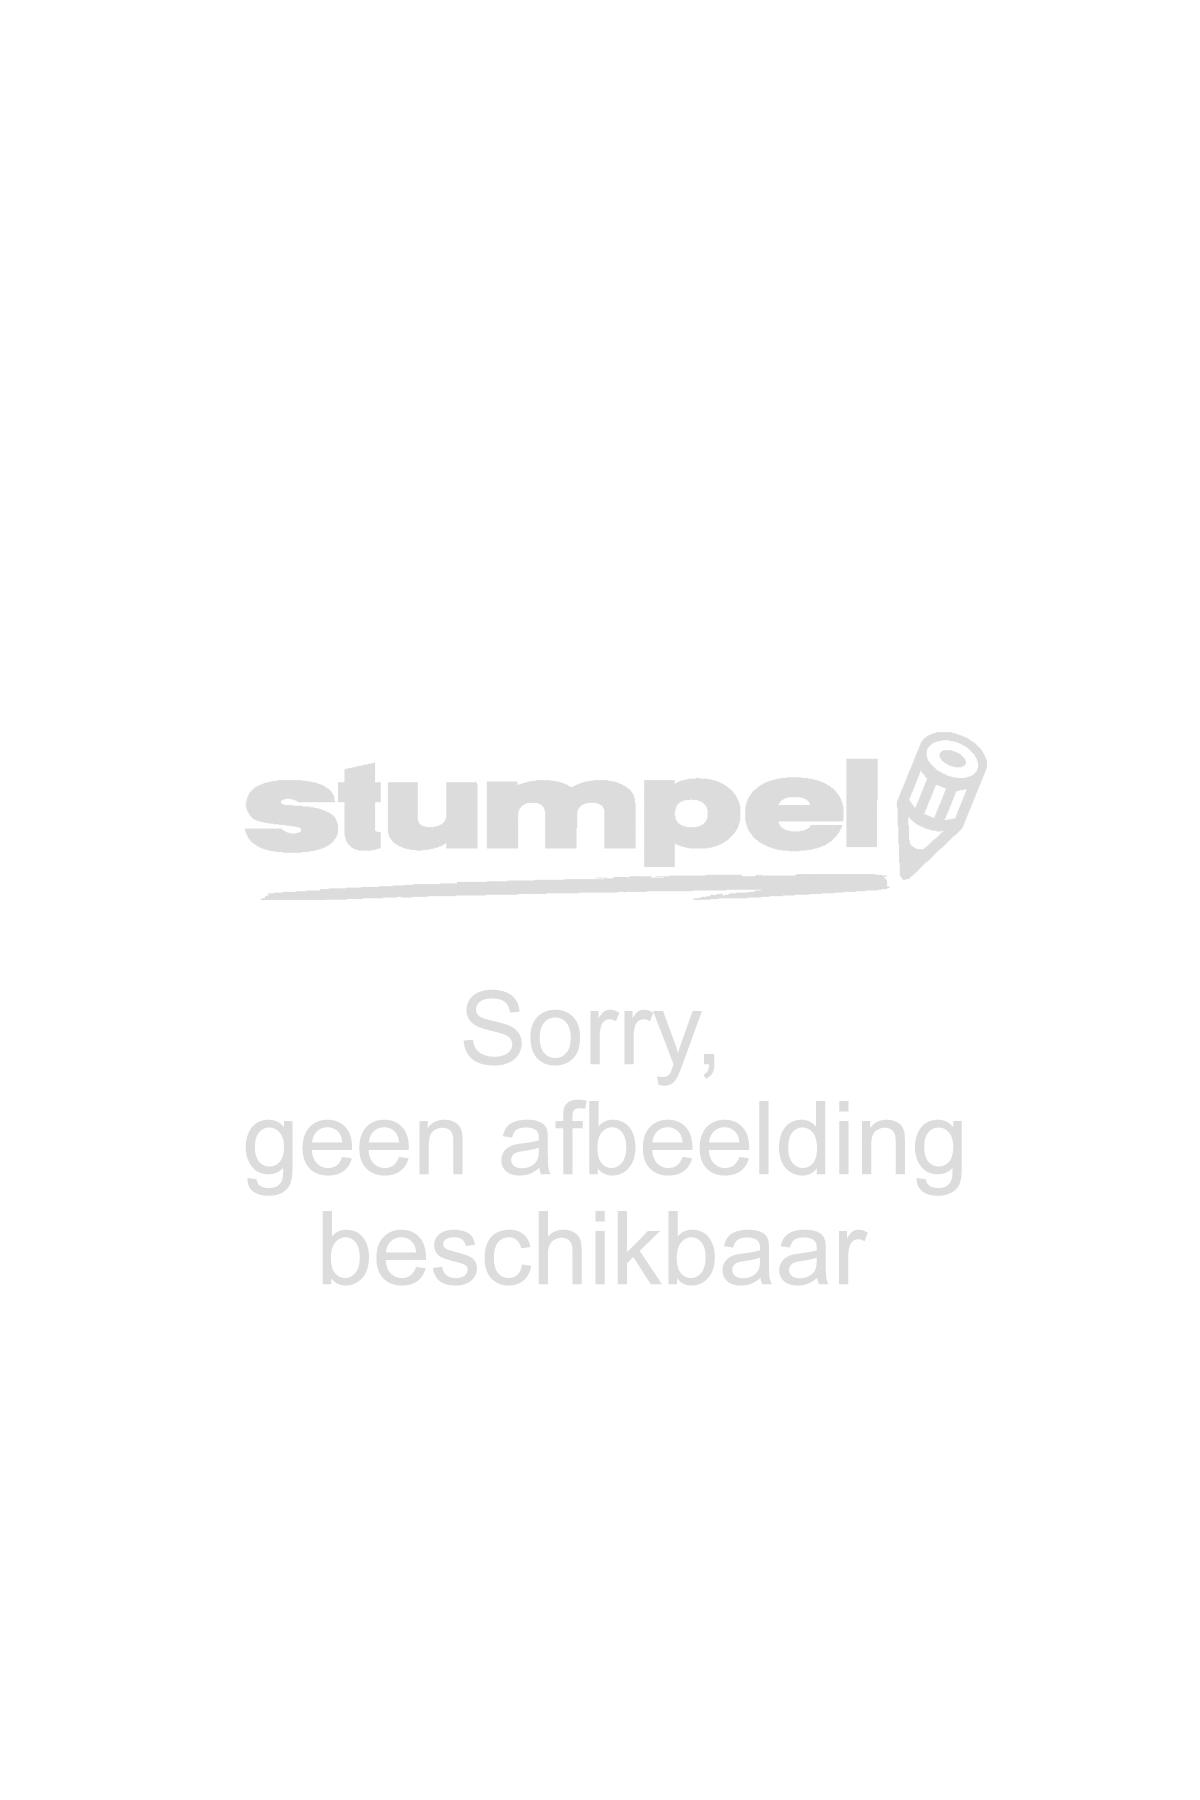 agenda-2021-ryam-inhoud-memoplan-7-staand-ringplastic-wit-nl-11011021